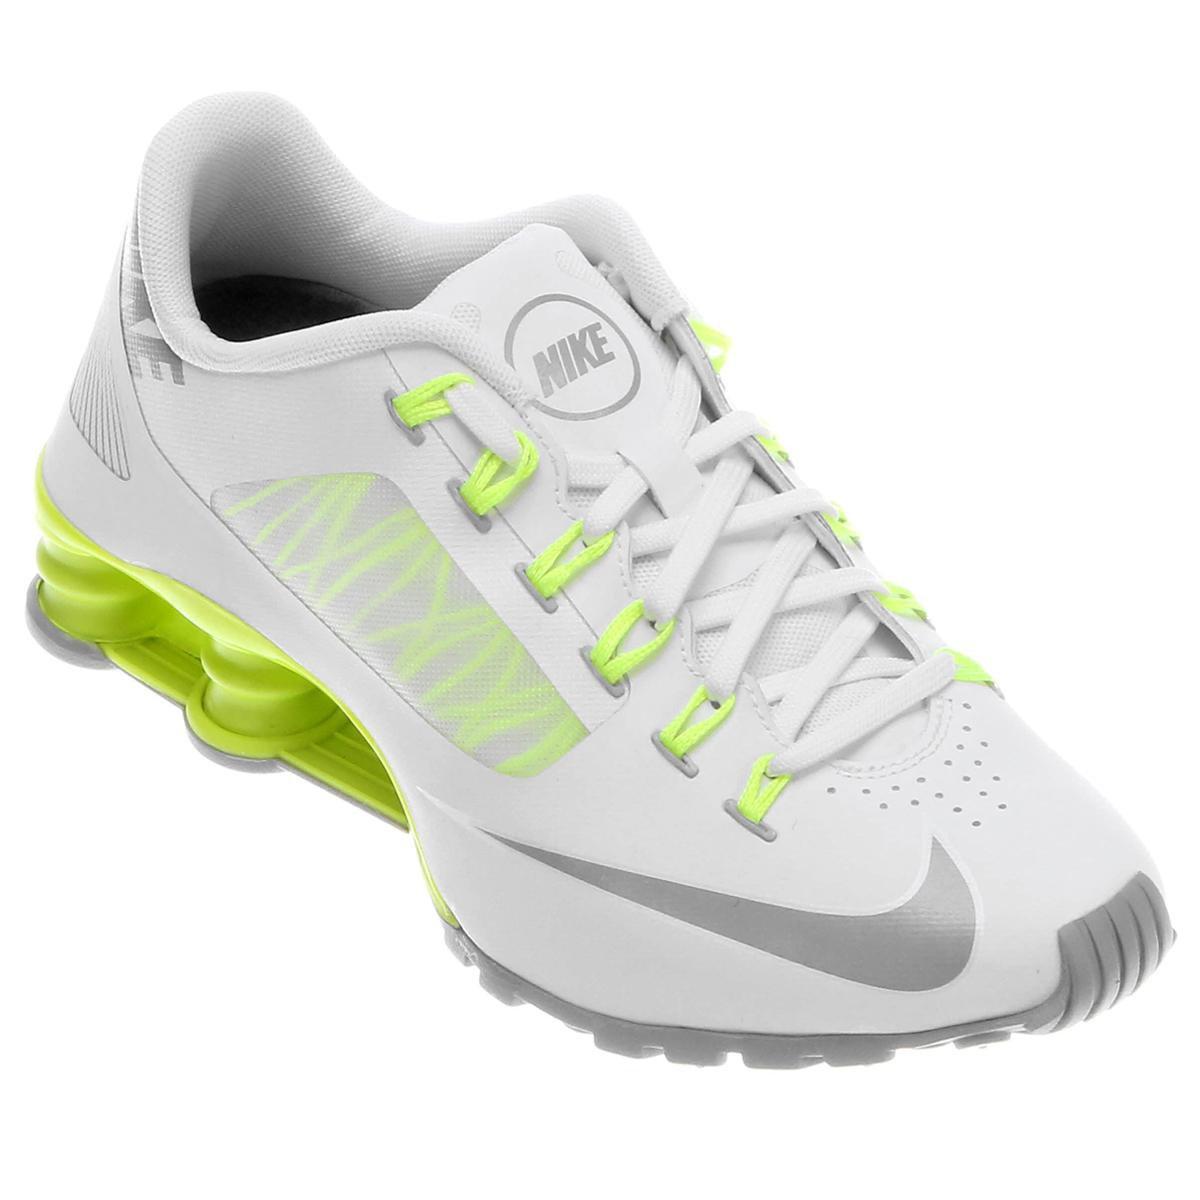 tenis nike shox branco e verde